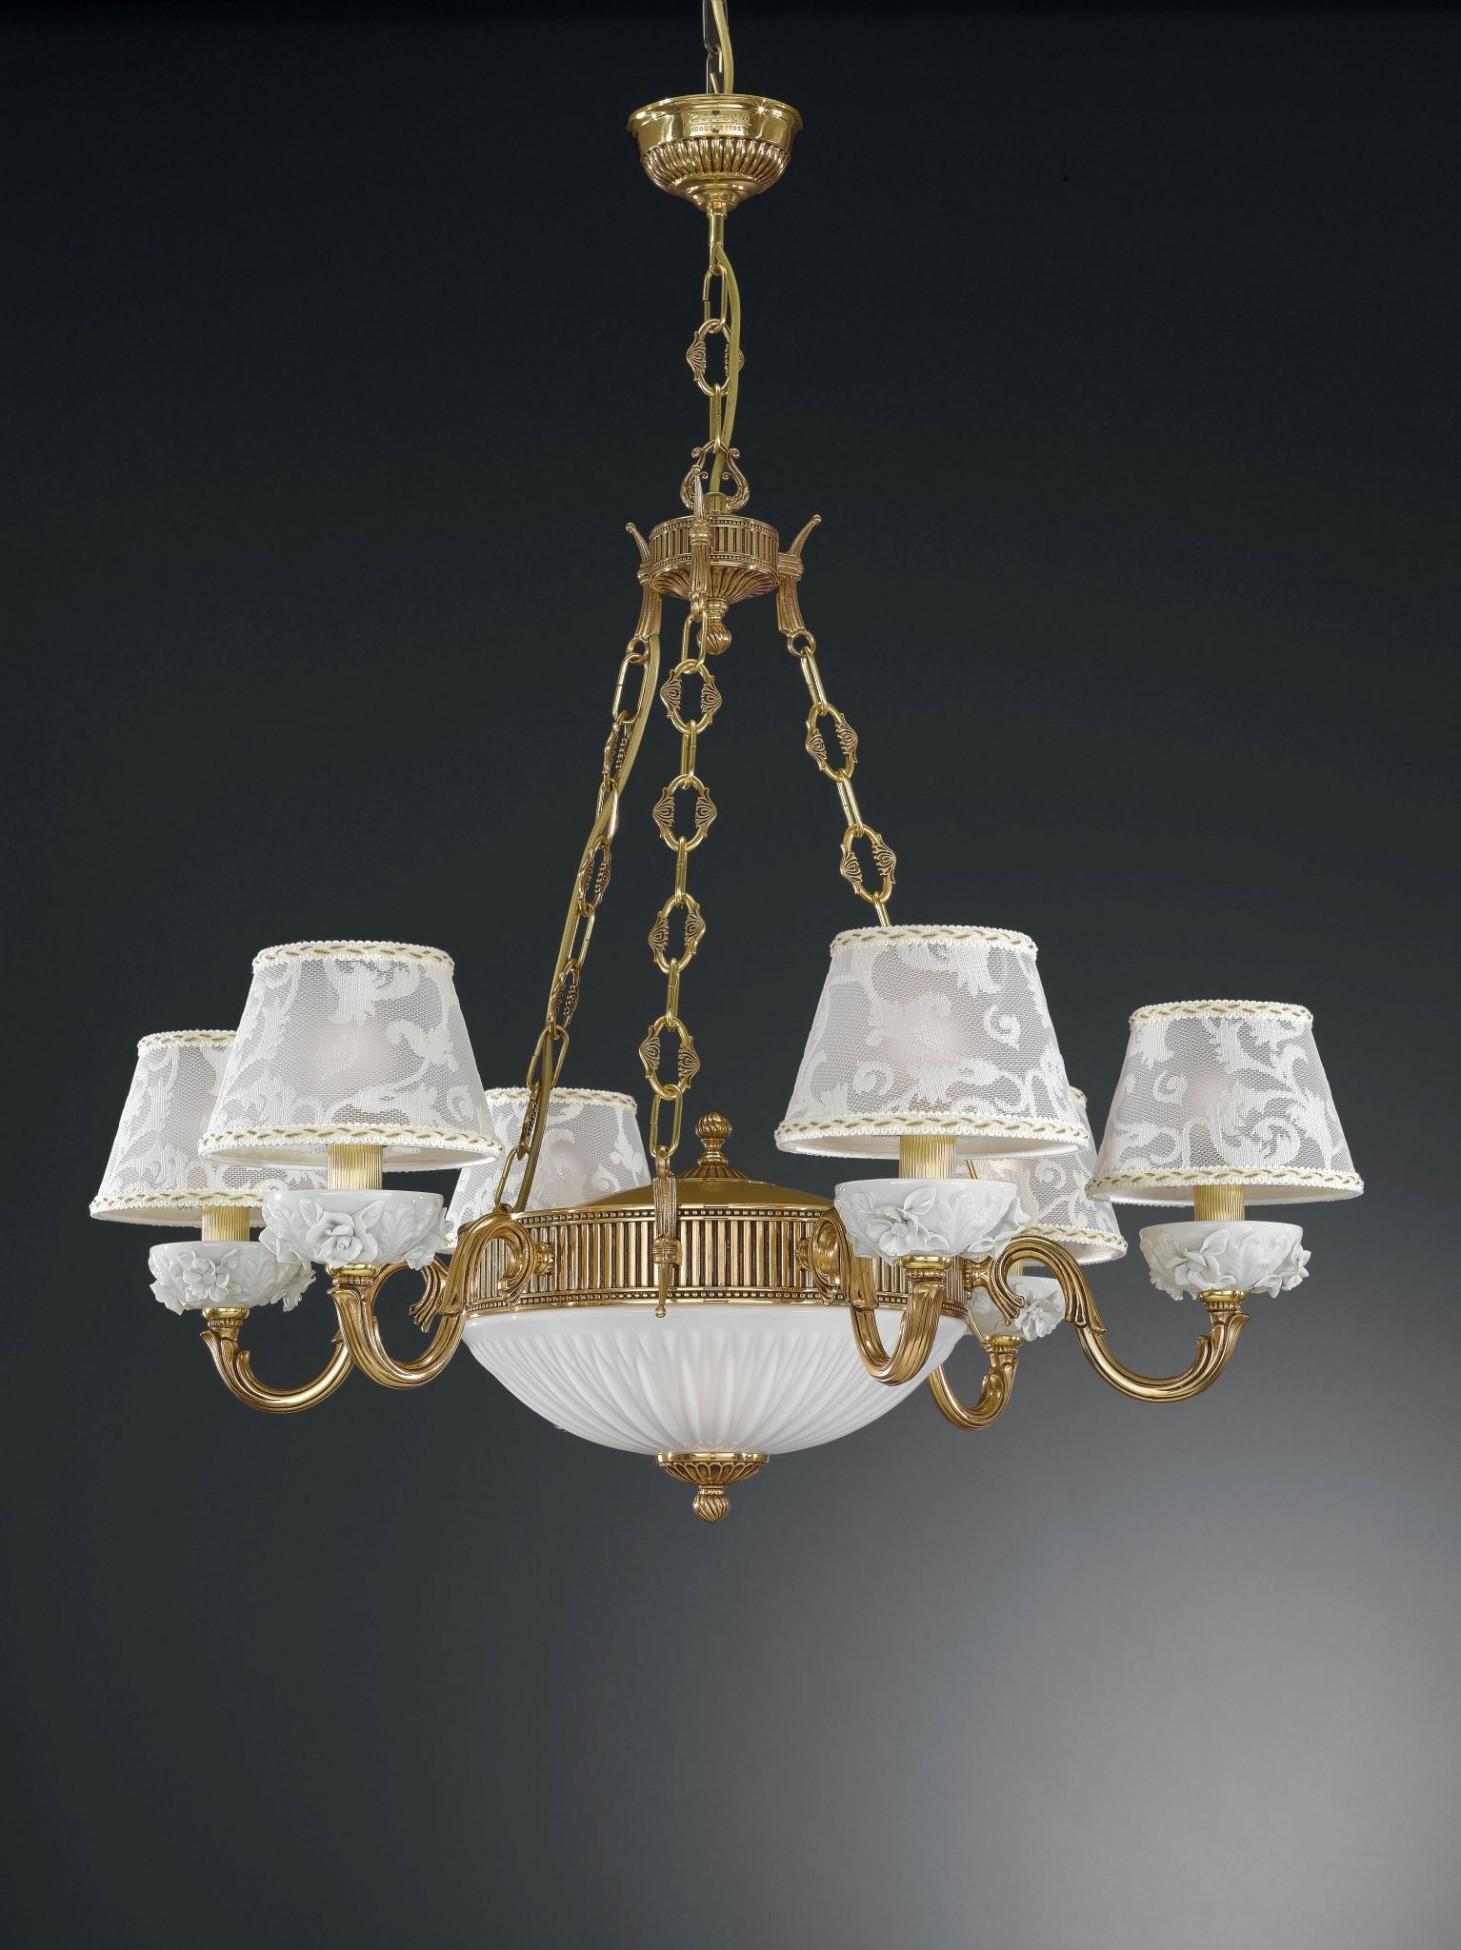 8 lights golden brass and white porcelain chandelier with lamp 8 lights golden brass and white porcelain chandelier with lamp shades arubaitofo Images